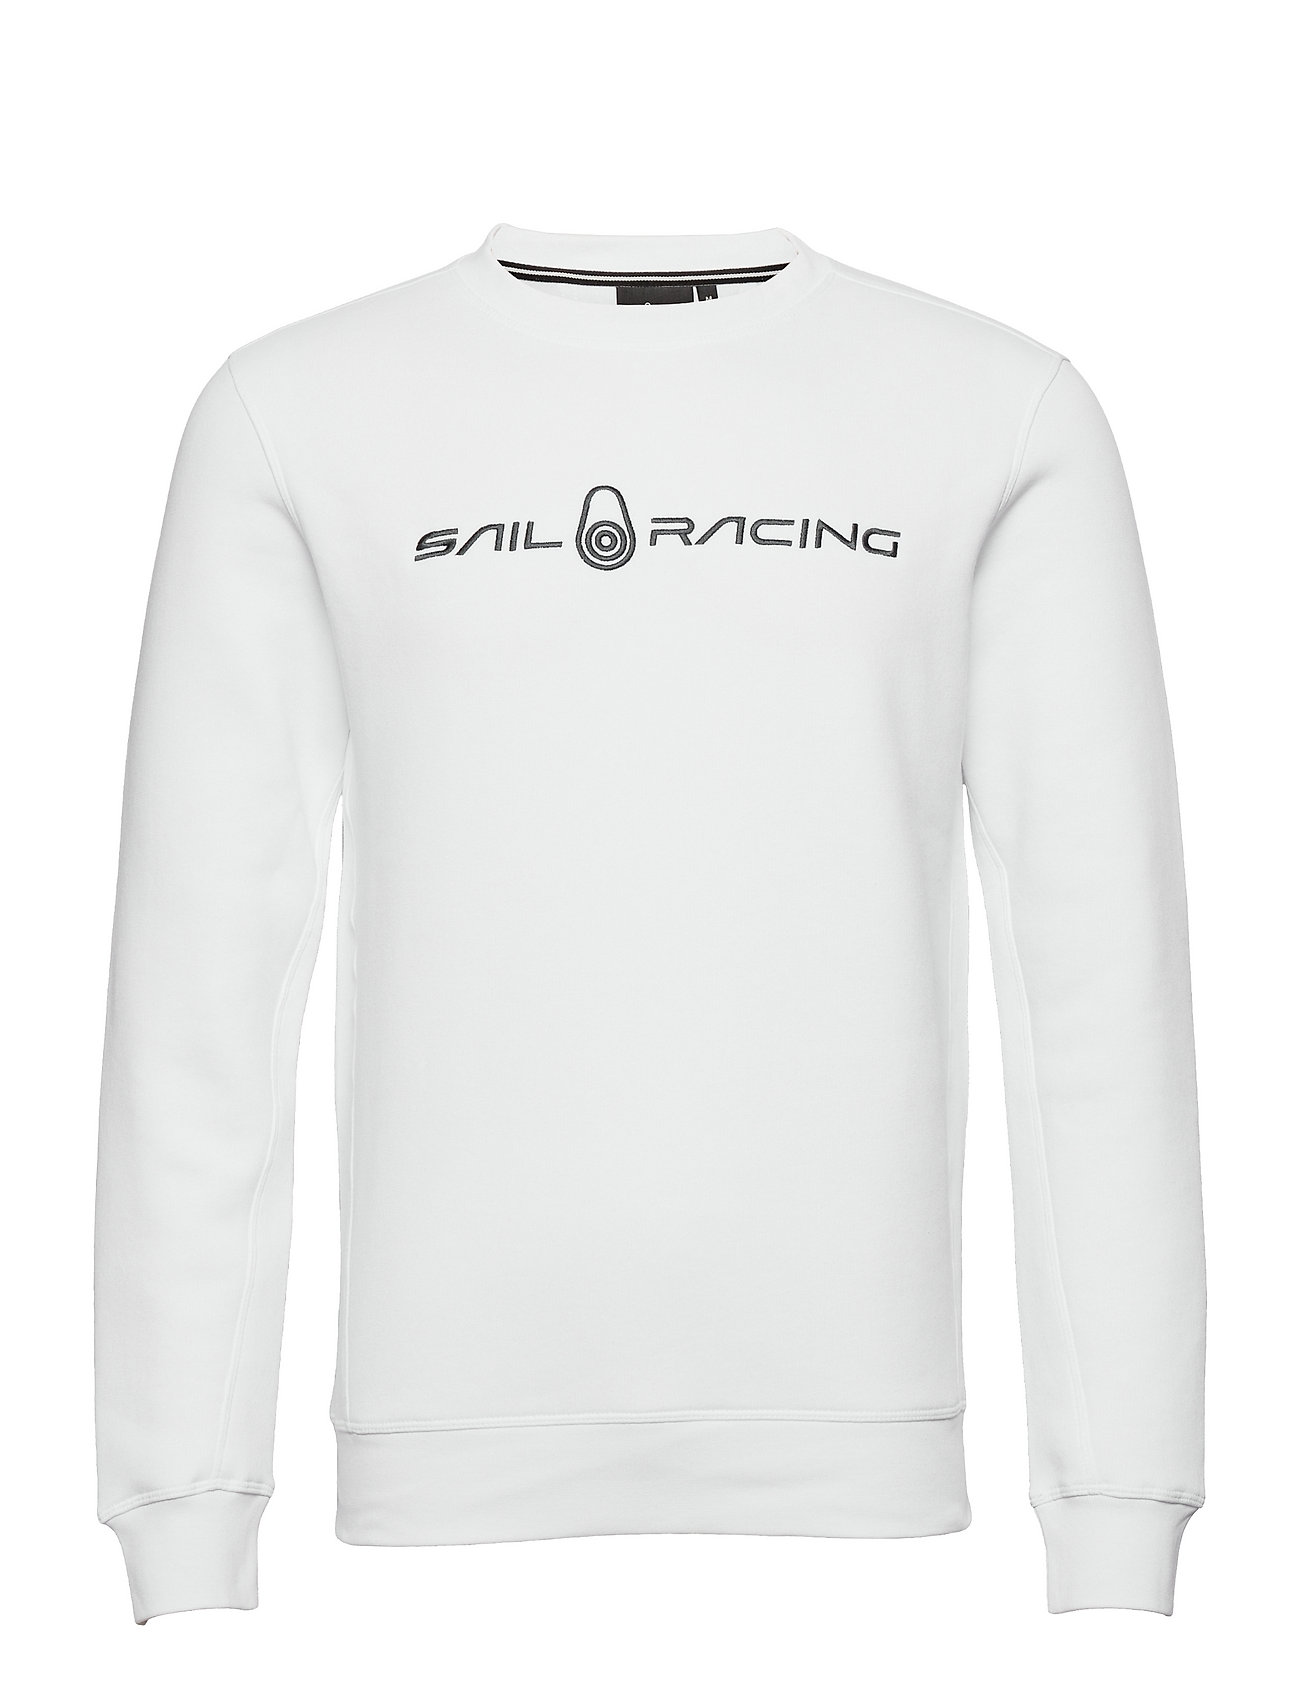 Bowman Sweater Sweatshirt Trøje Hvid Sail Racing